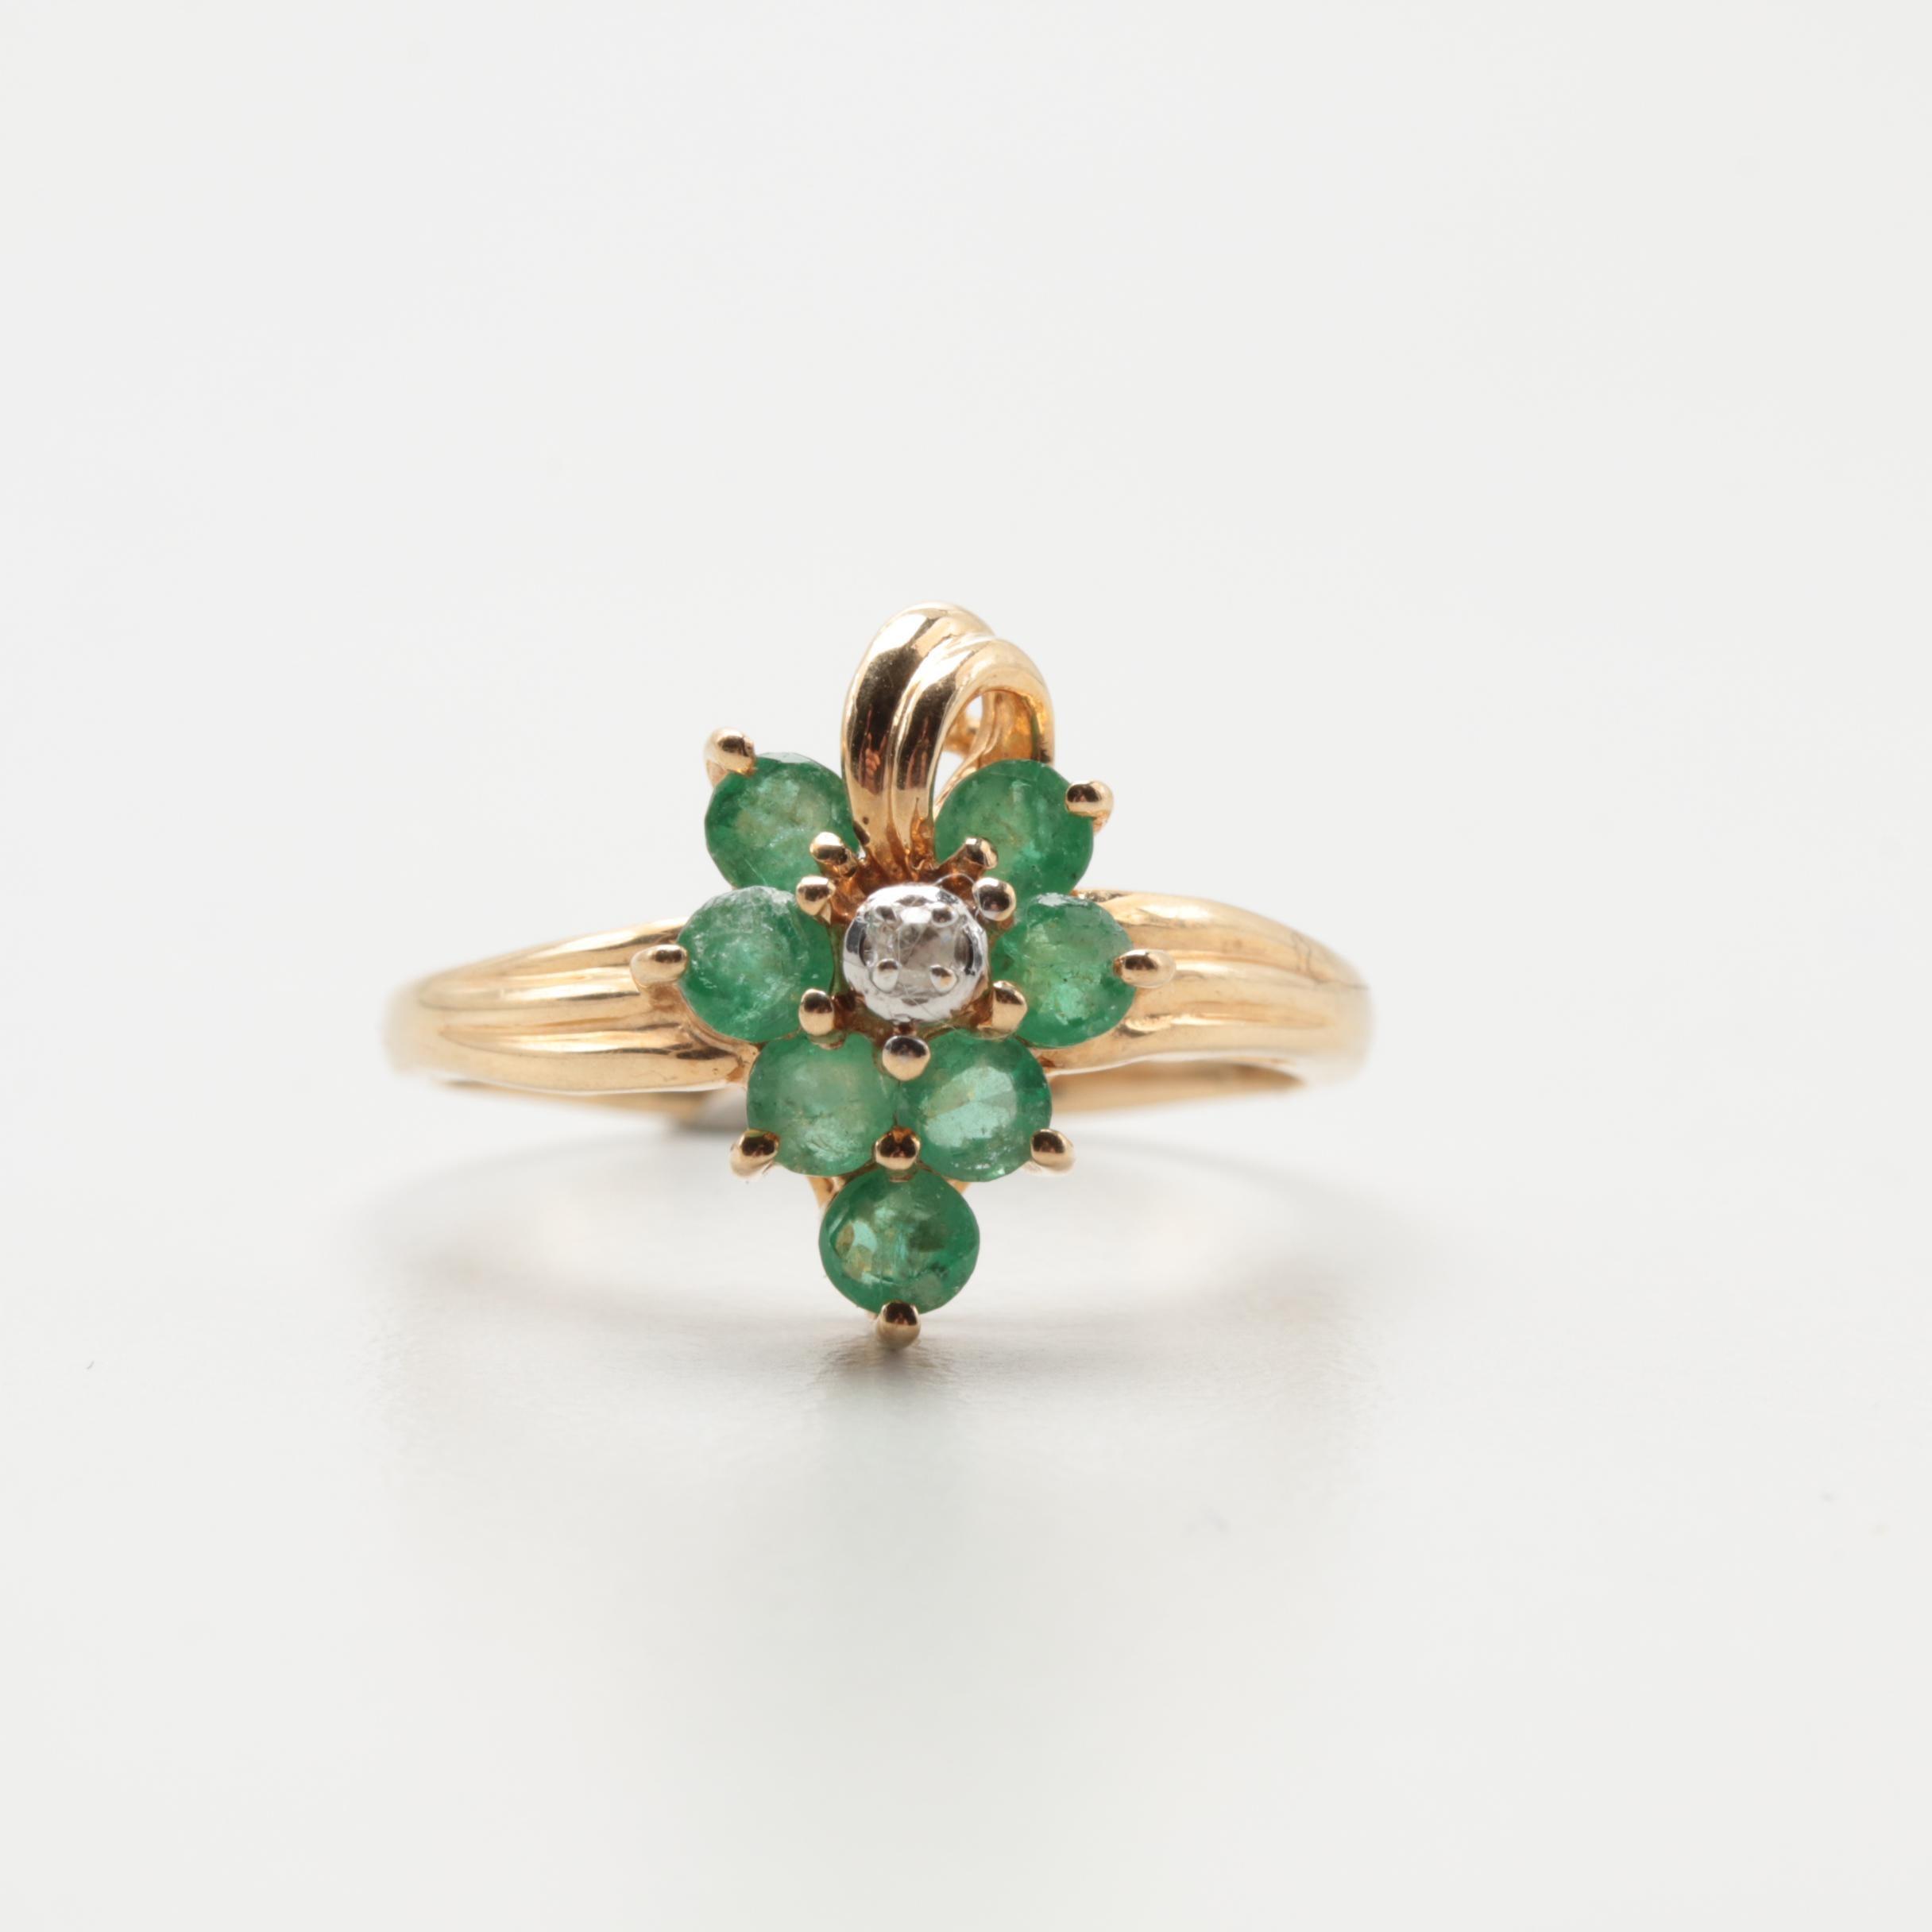 10K Yellow Gold Emerald and Diamond Ring